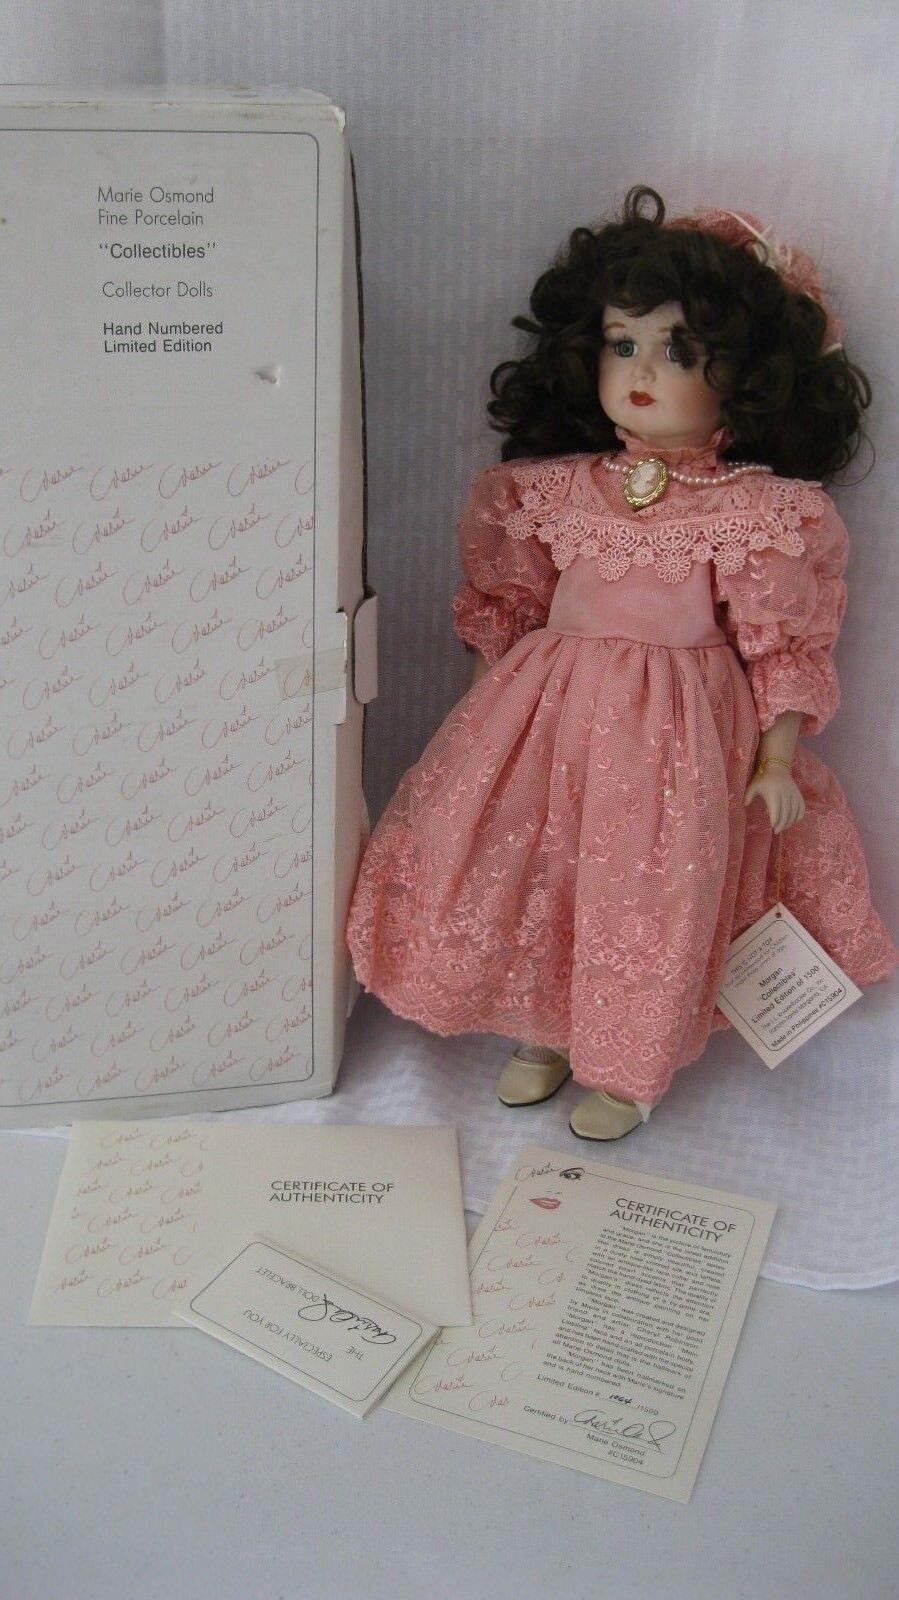 Marie Osmond Porcelana Fina Morgan Muñeca 17  Coleccionables Serie rosado Usado Con Caja